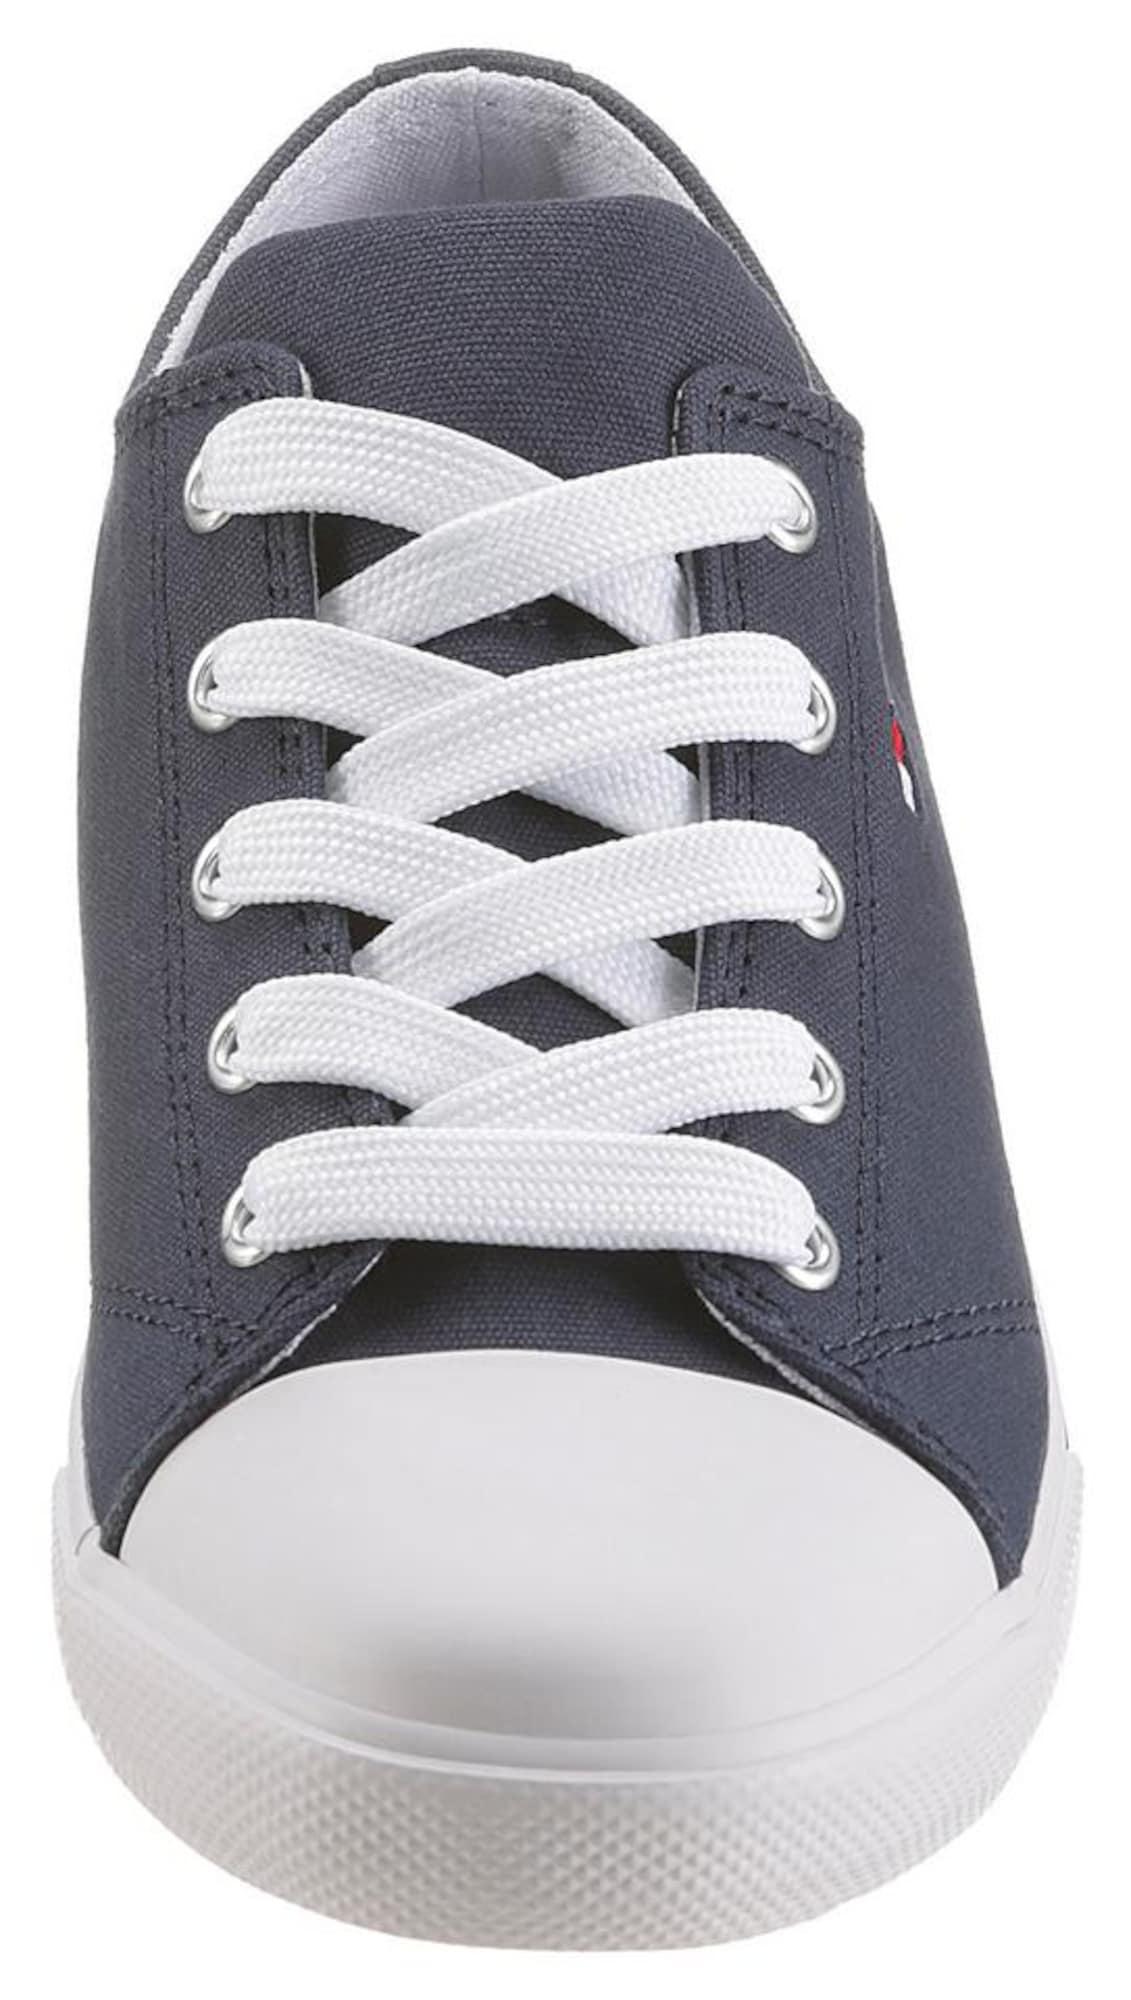 TOMMY HILFIGER Baskets  bleu denim / blanc